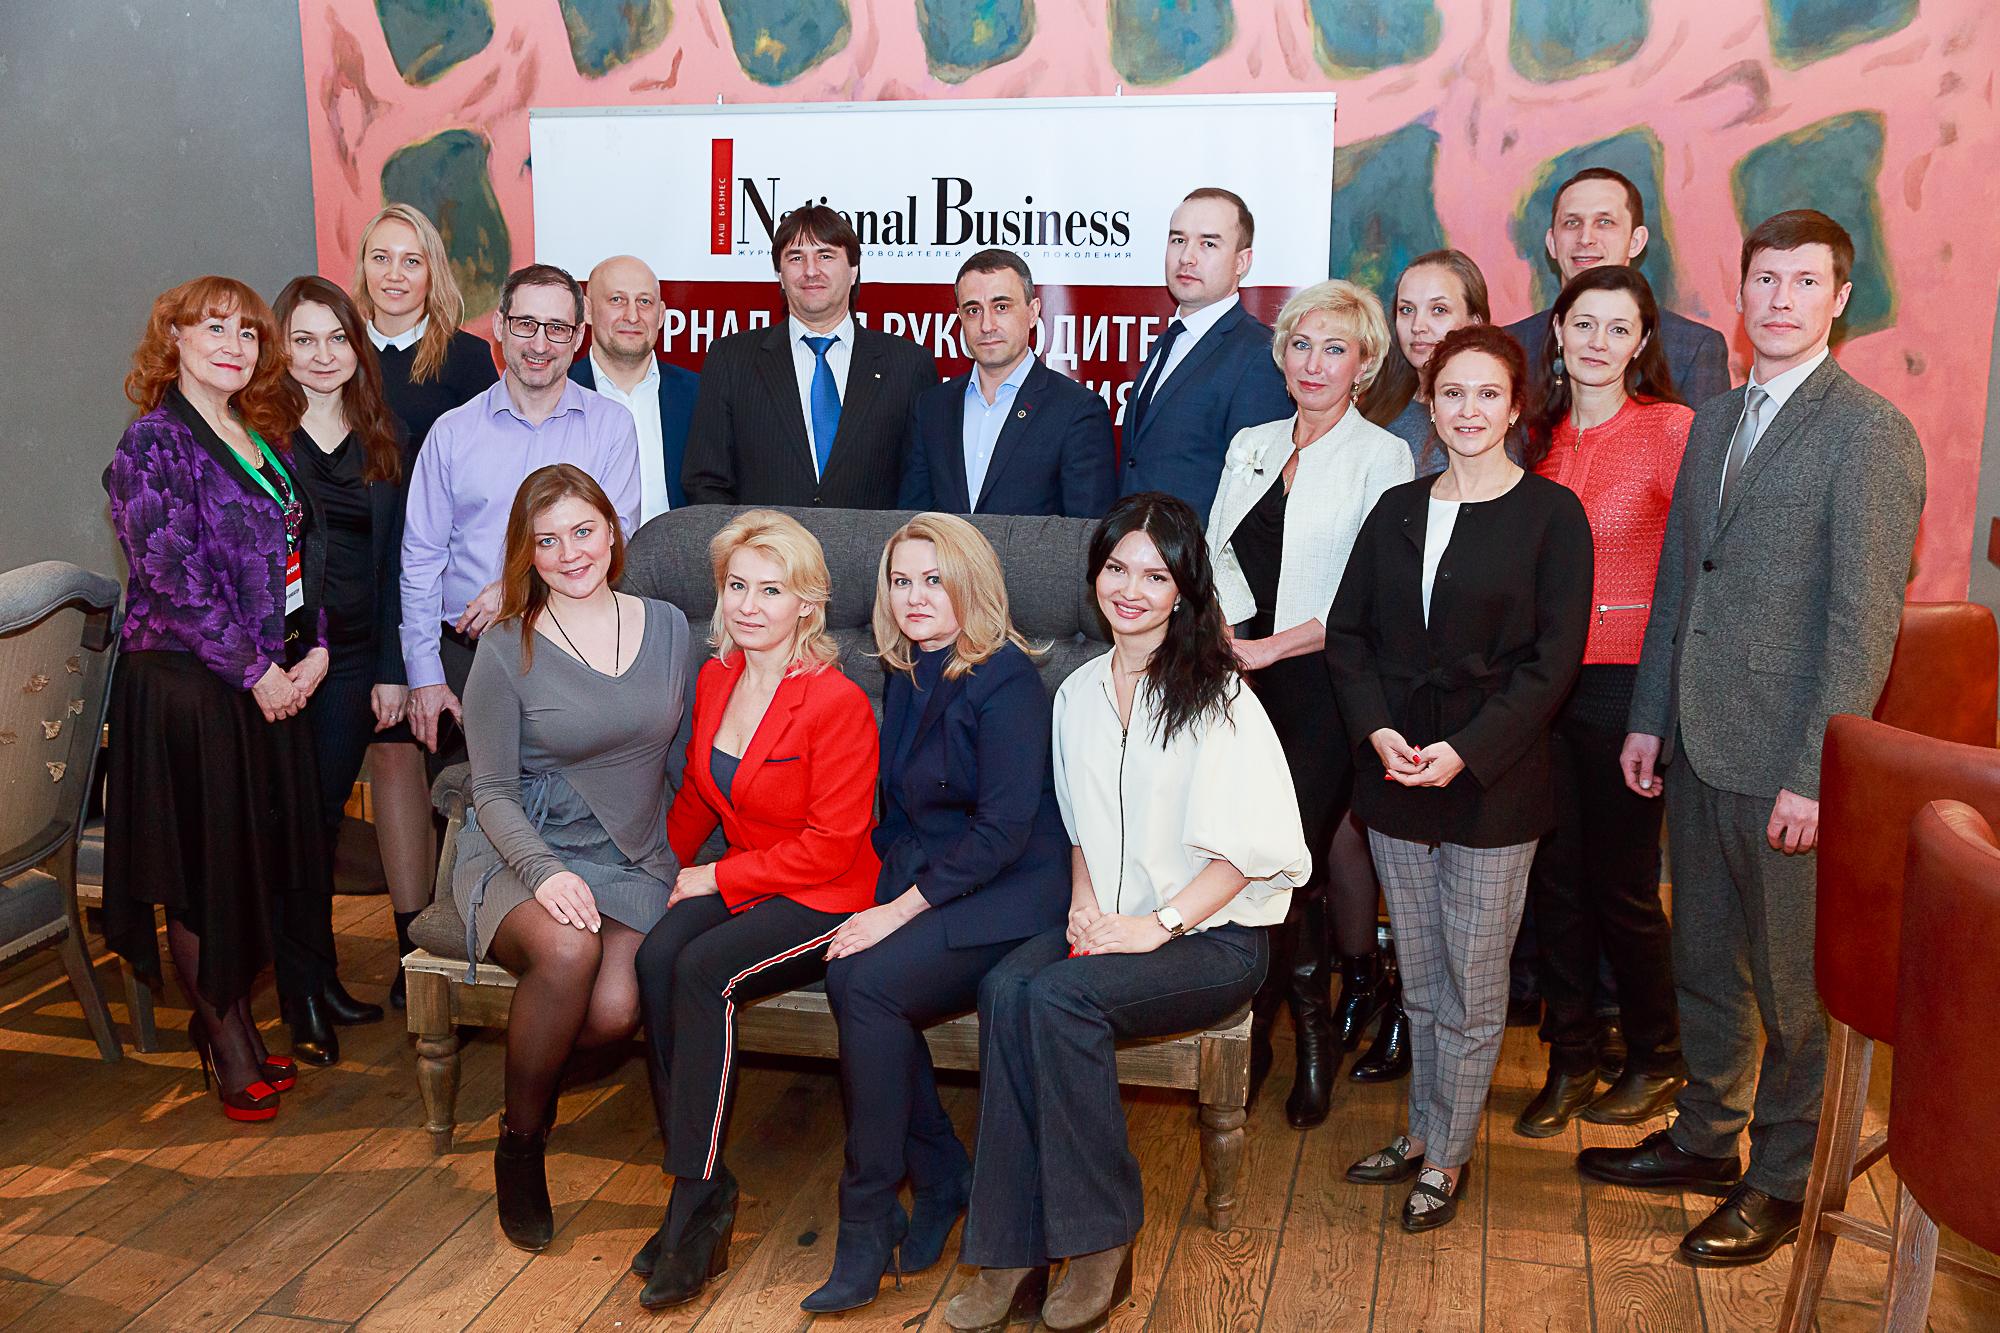 Встреча бизнесменов National Business 2018